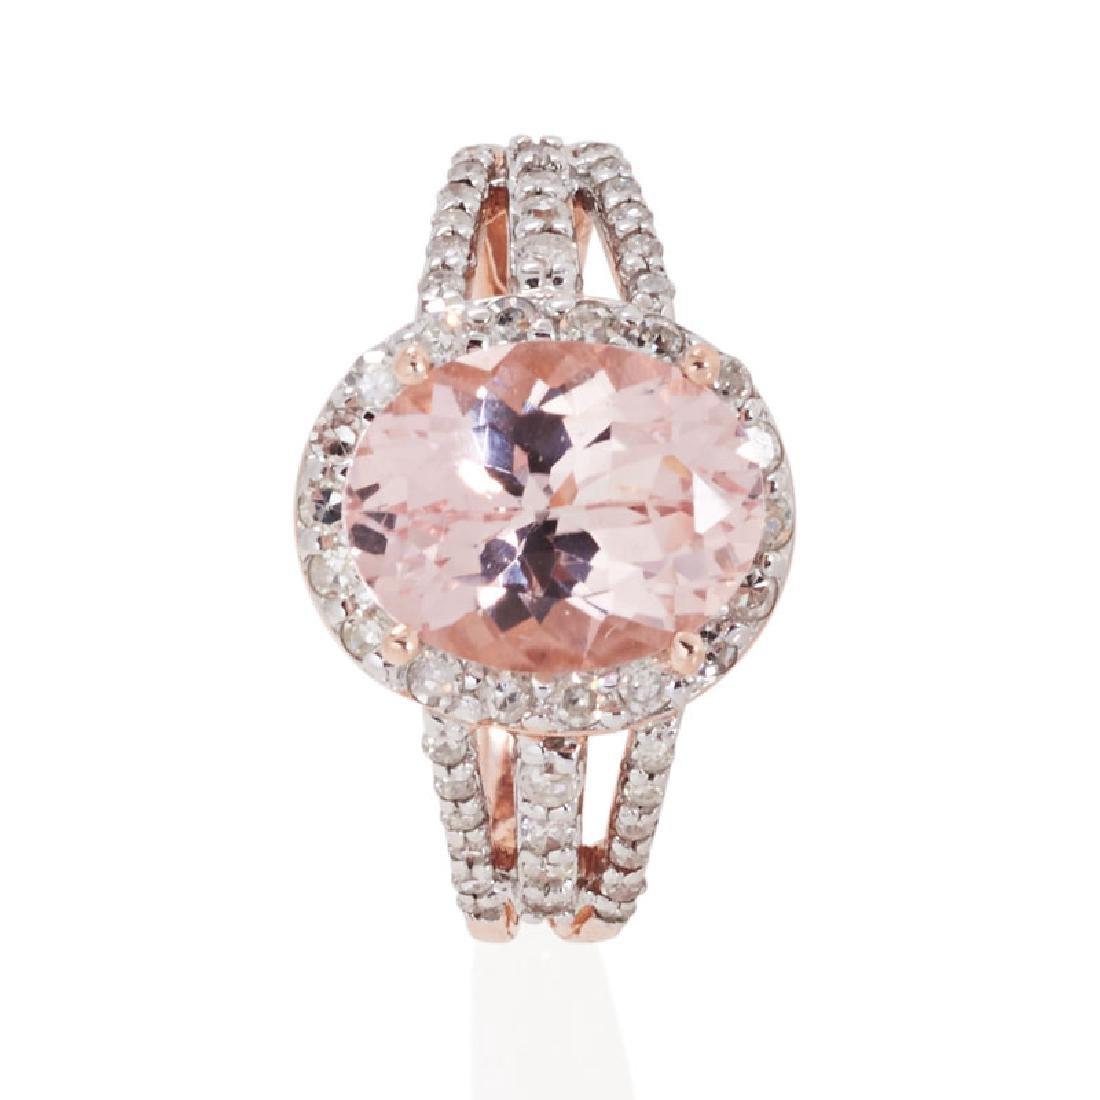 MORGANITE, DIAMOND & ROSE GOLD RING